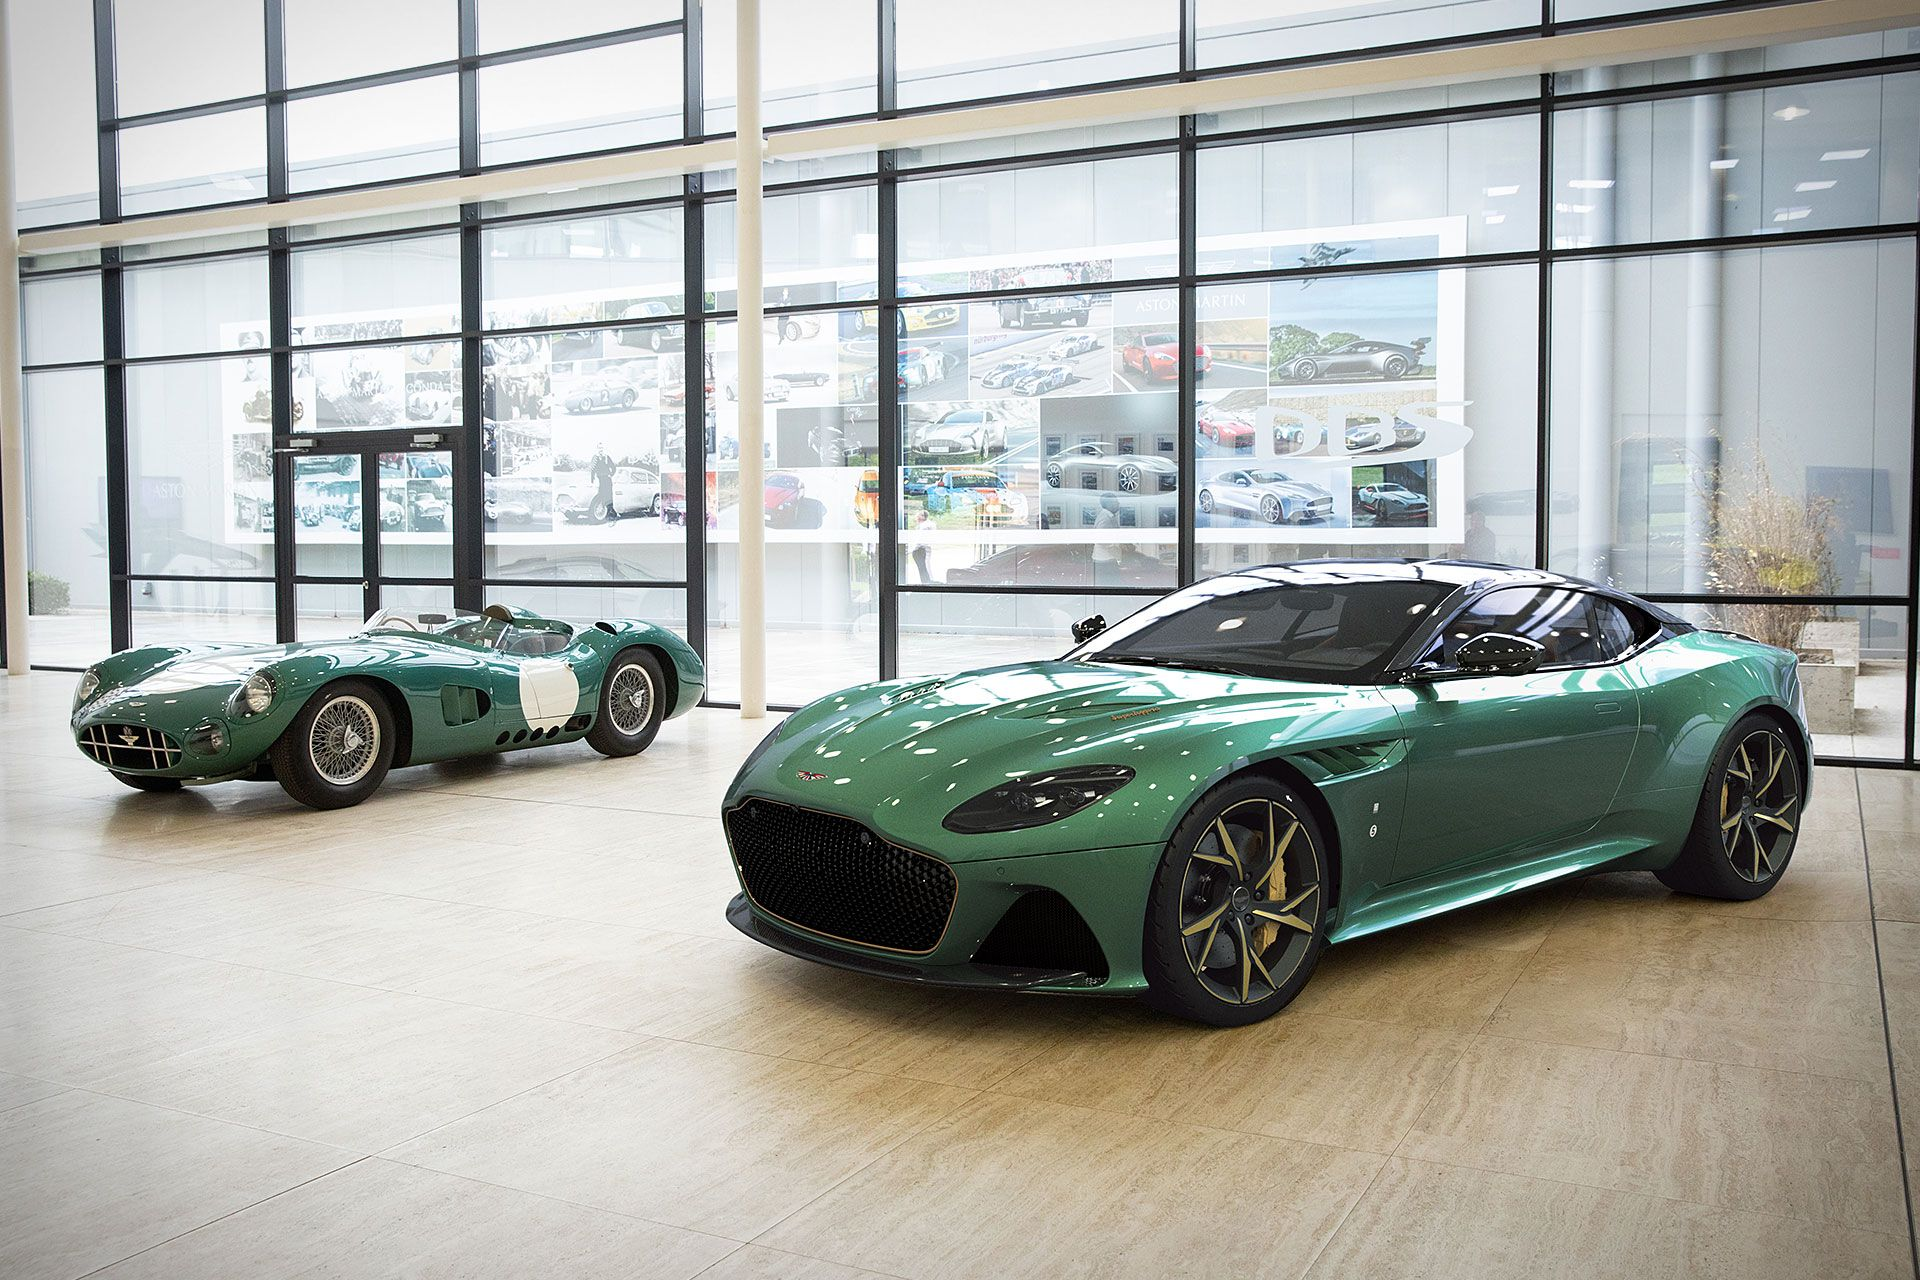 Aston Martin DBS 59 Coupe